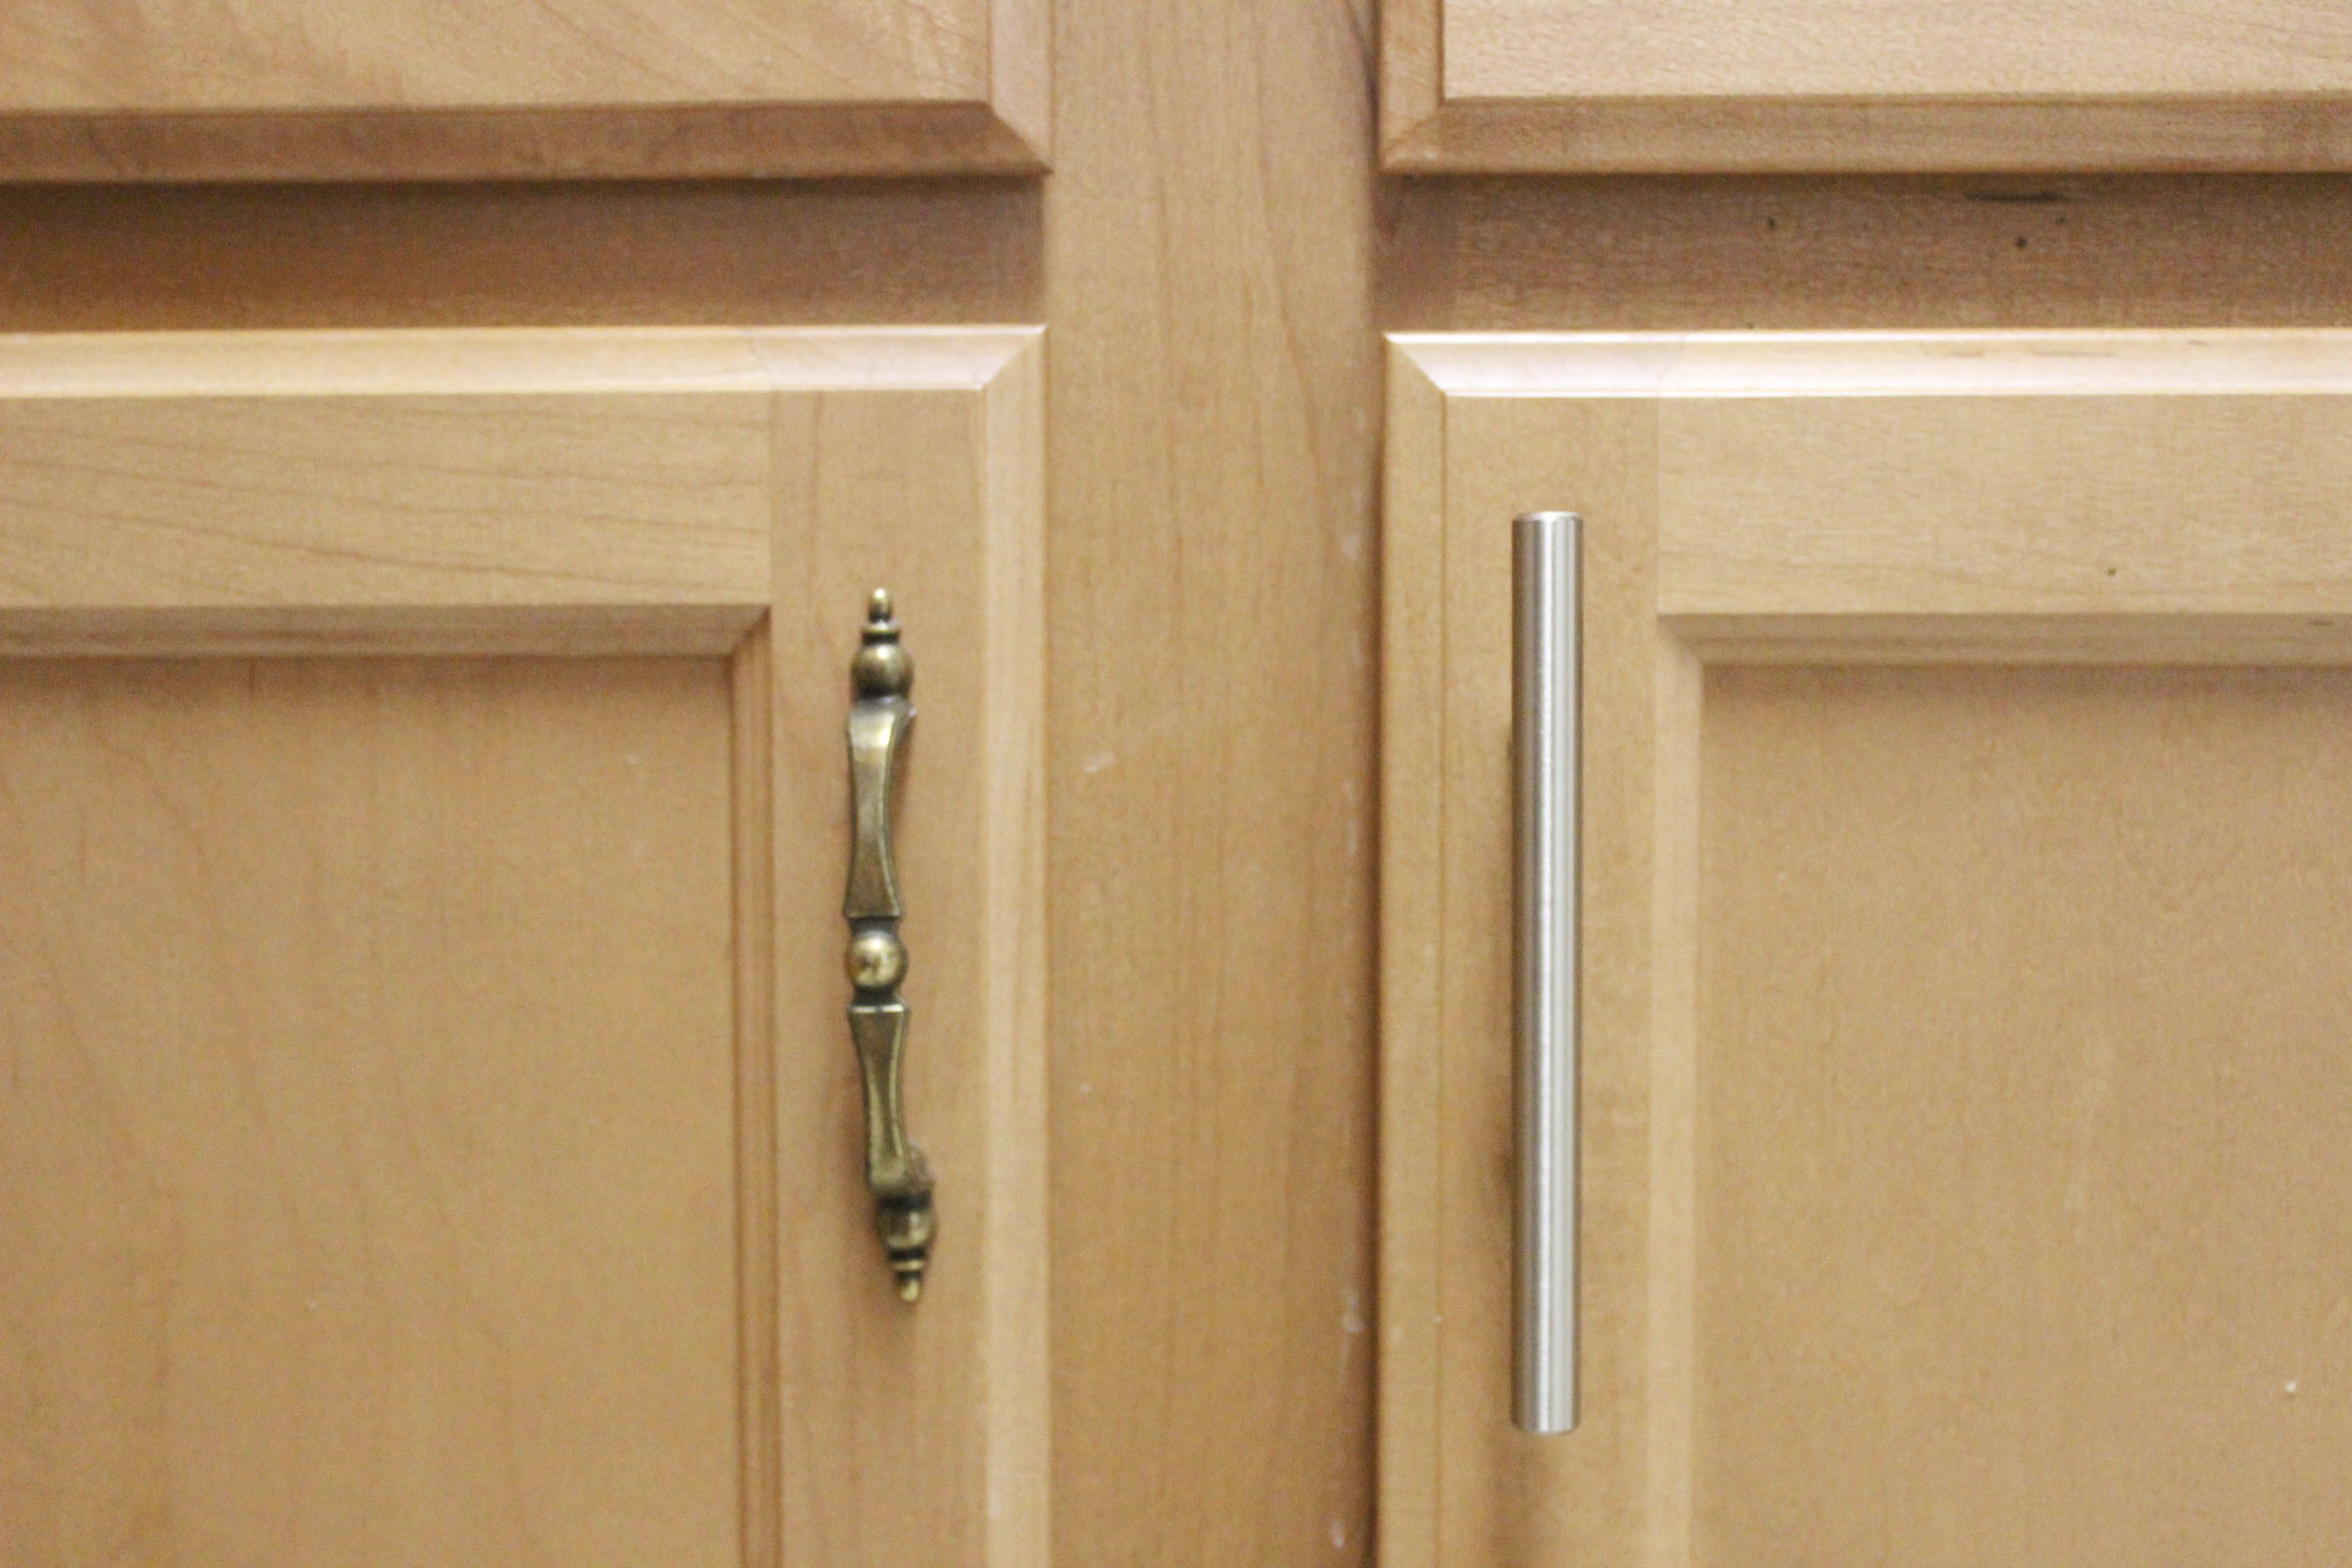 Cabinet Hardware Upgrade Kitchen Cabinet Door Handles Cabinet Door Handles Cabinet Handles